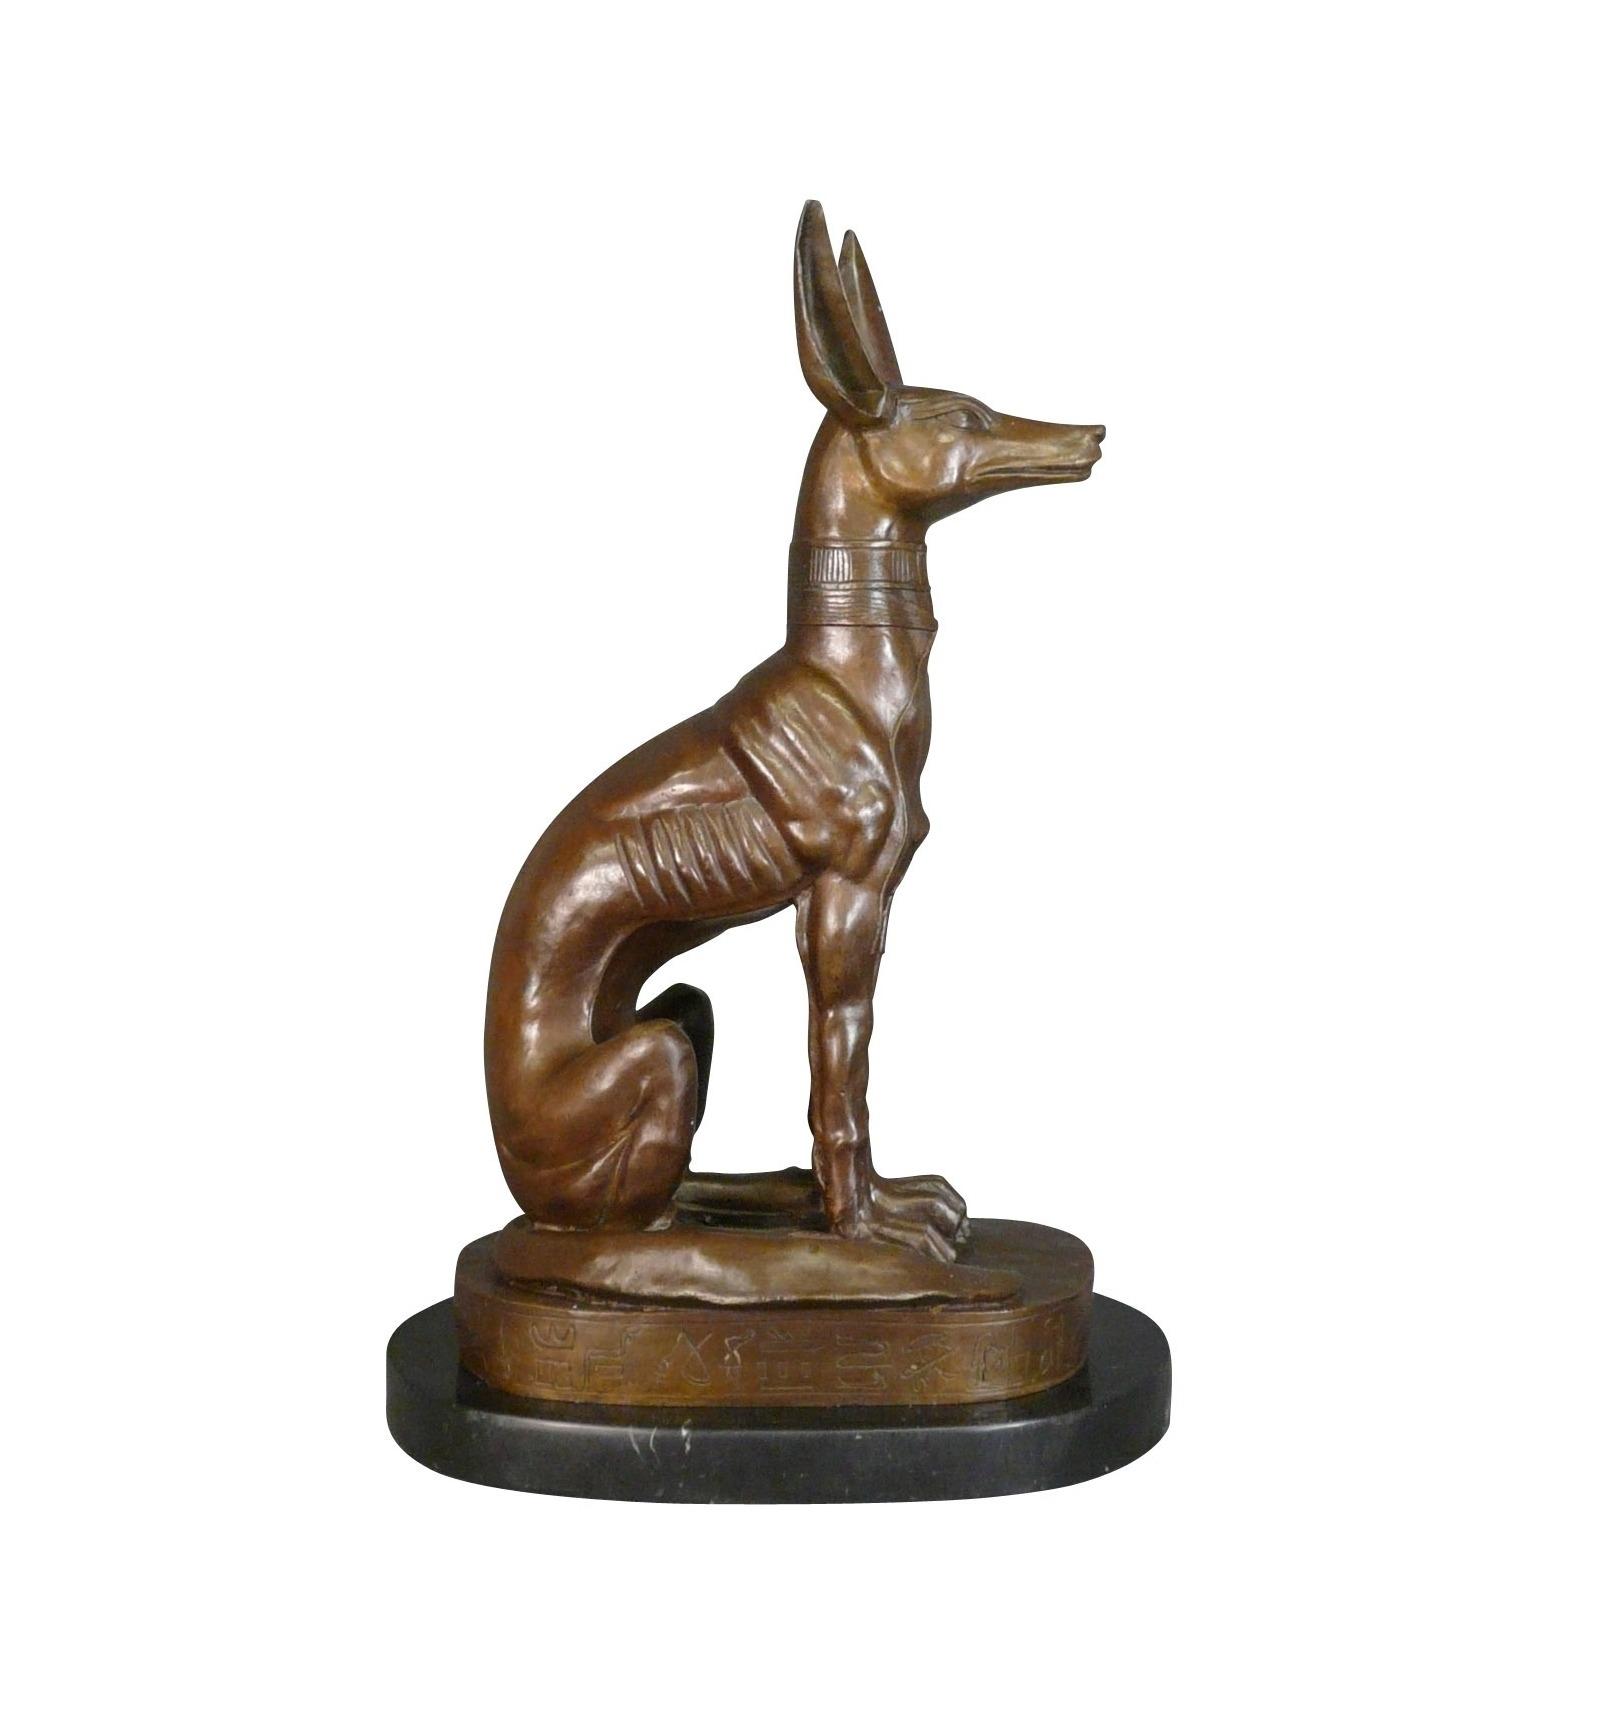 A Bronze Statue Of The God Anubis Mythology Egypt